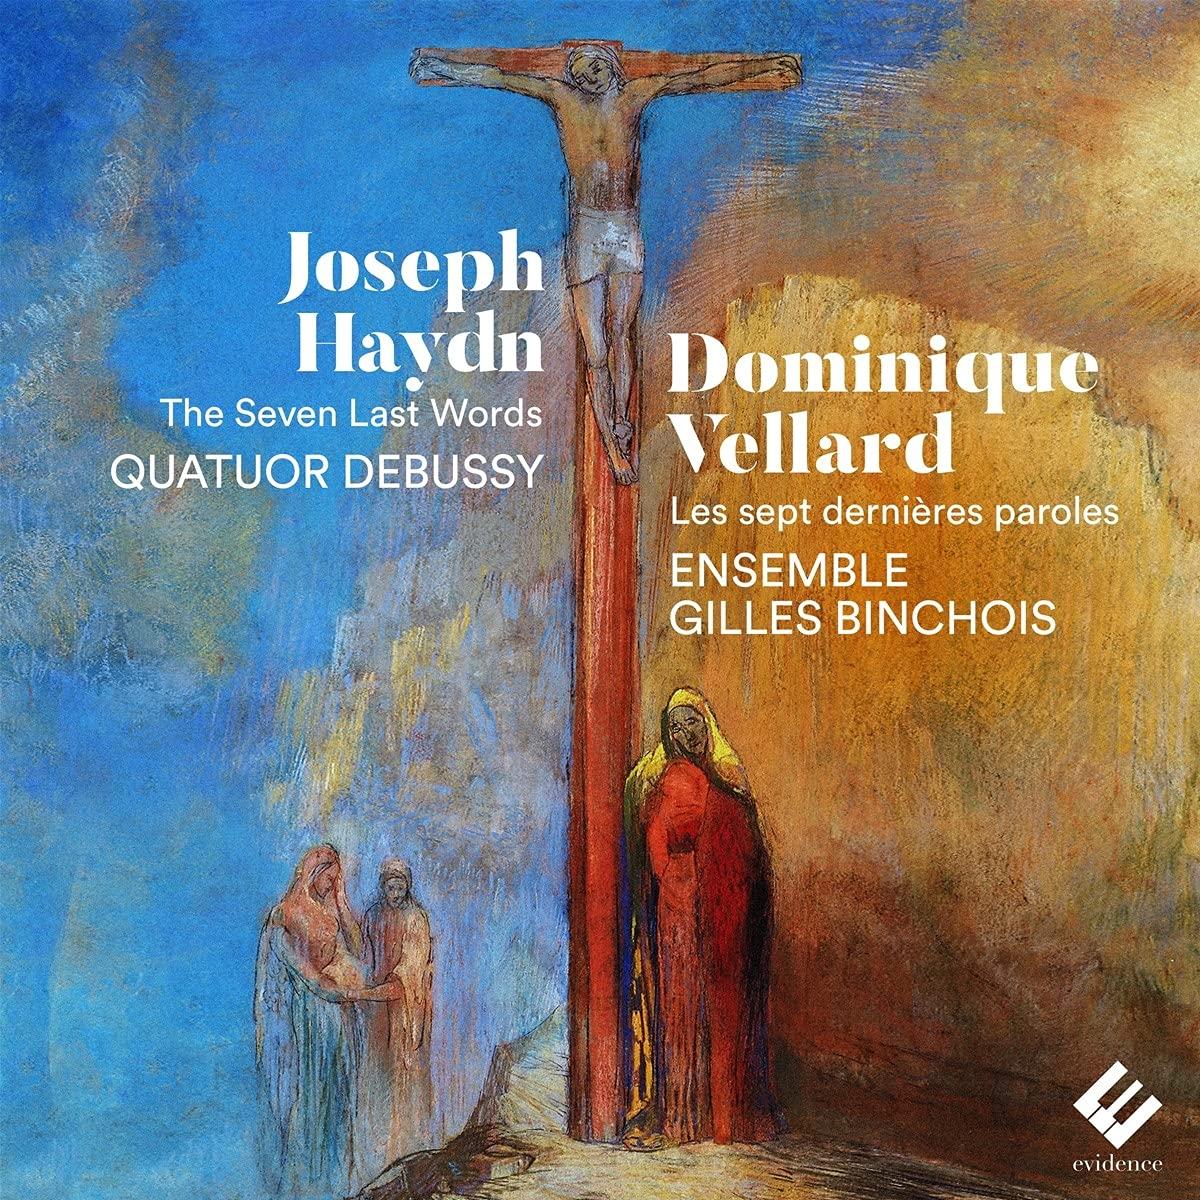 Haydn / Vellard: The Seven Last Words - Quatuor Debussy